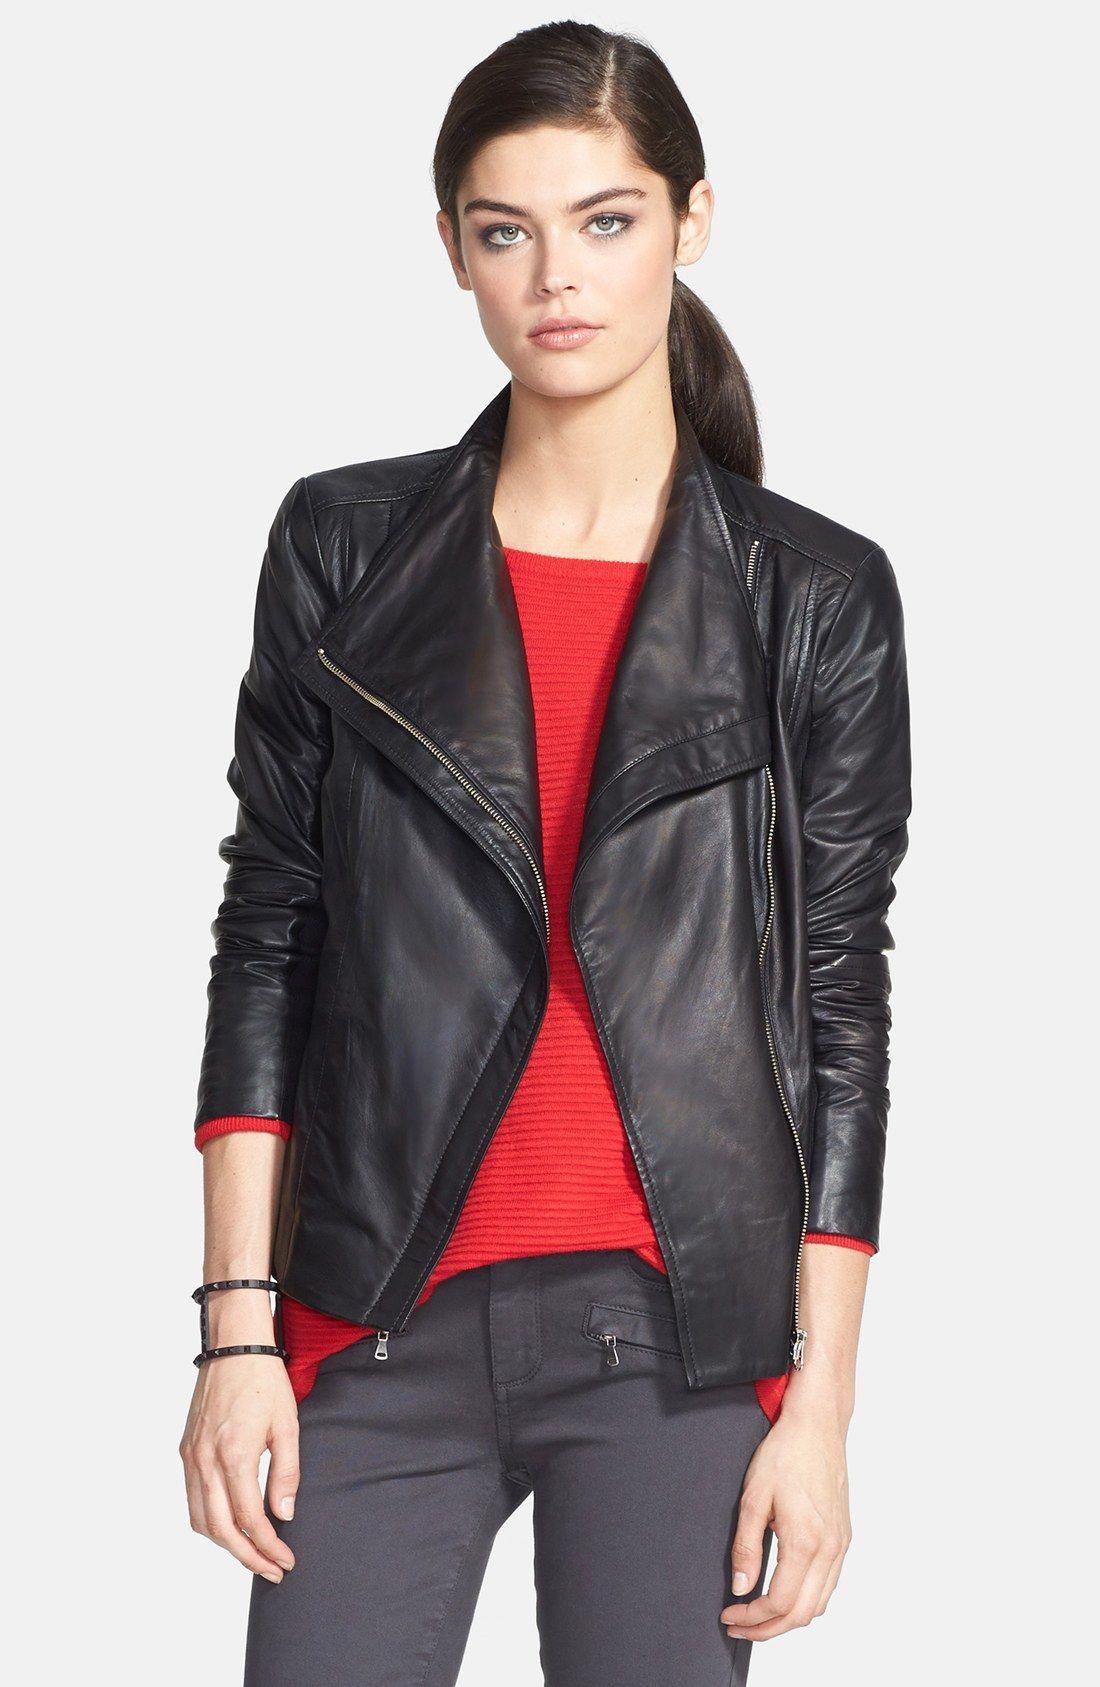 Chelsea28 Leather Moto Jacket Nordstrom Leather Moto Jacket Leather Jackets Women Leather Jacket [ 1687 x 1100 Pixel ]